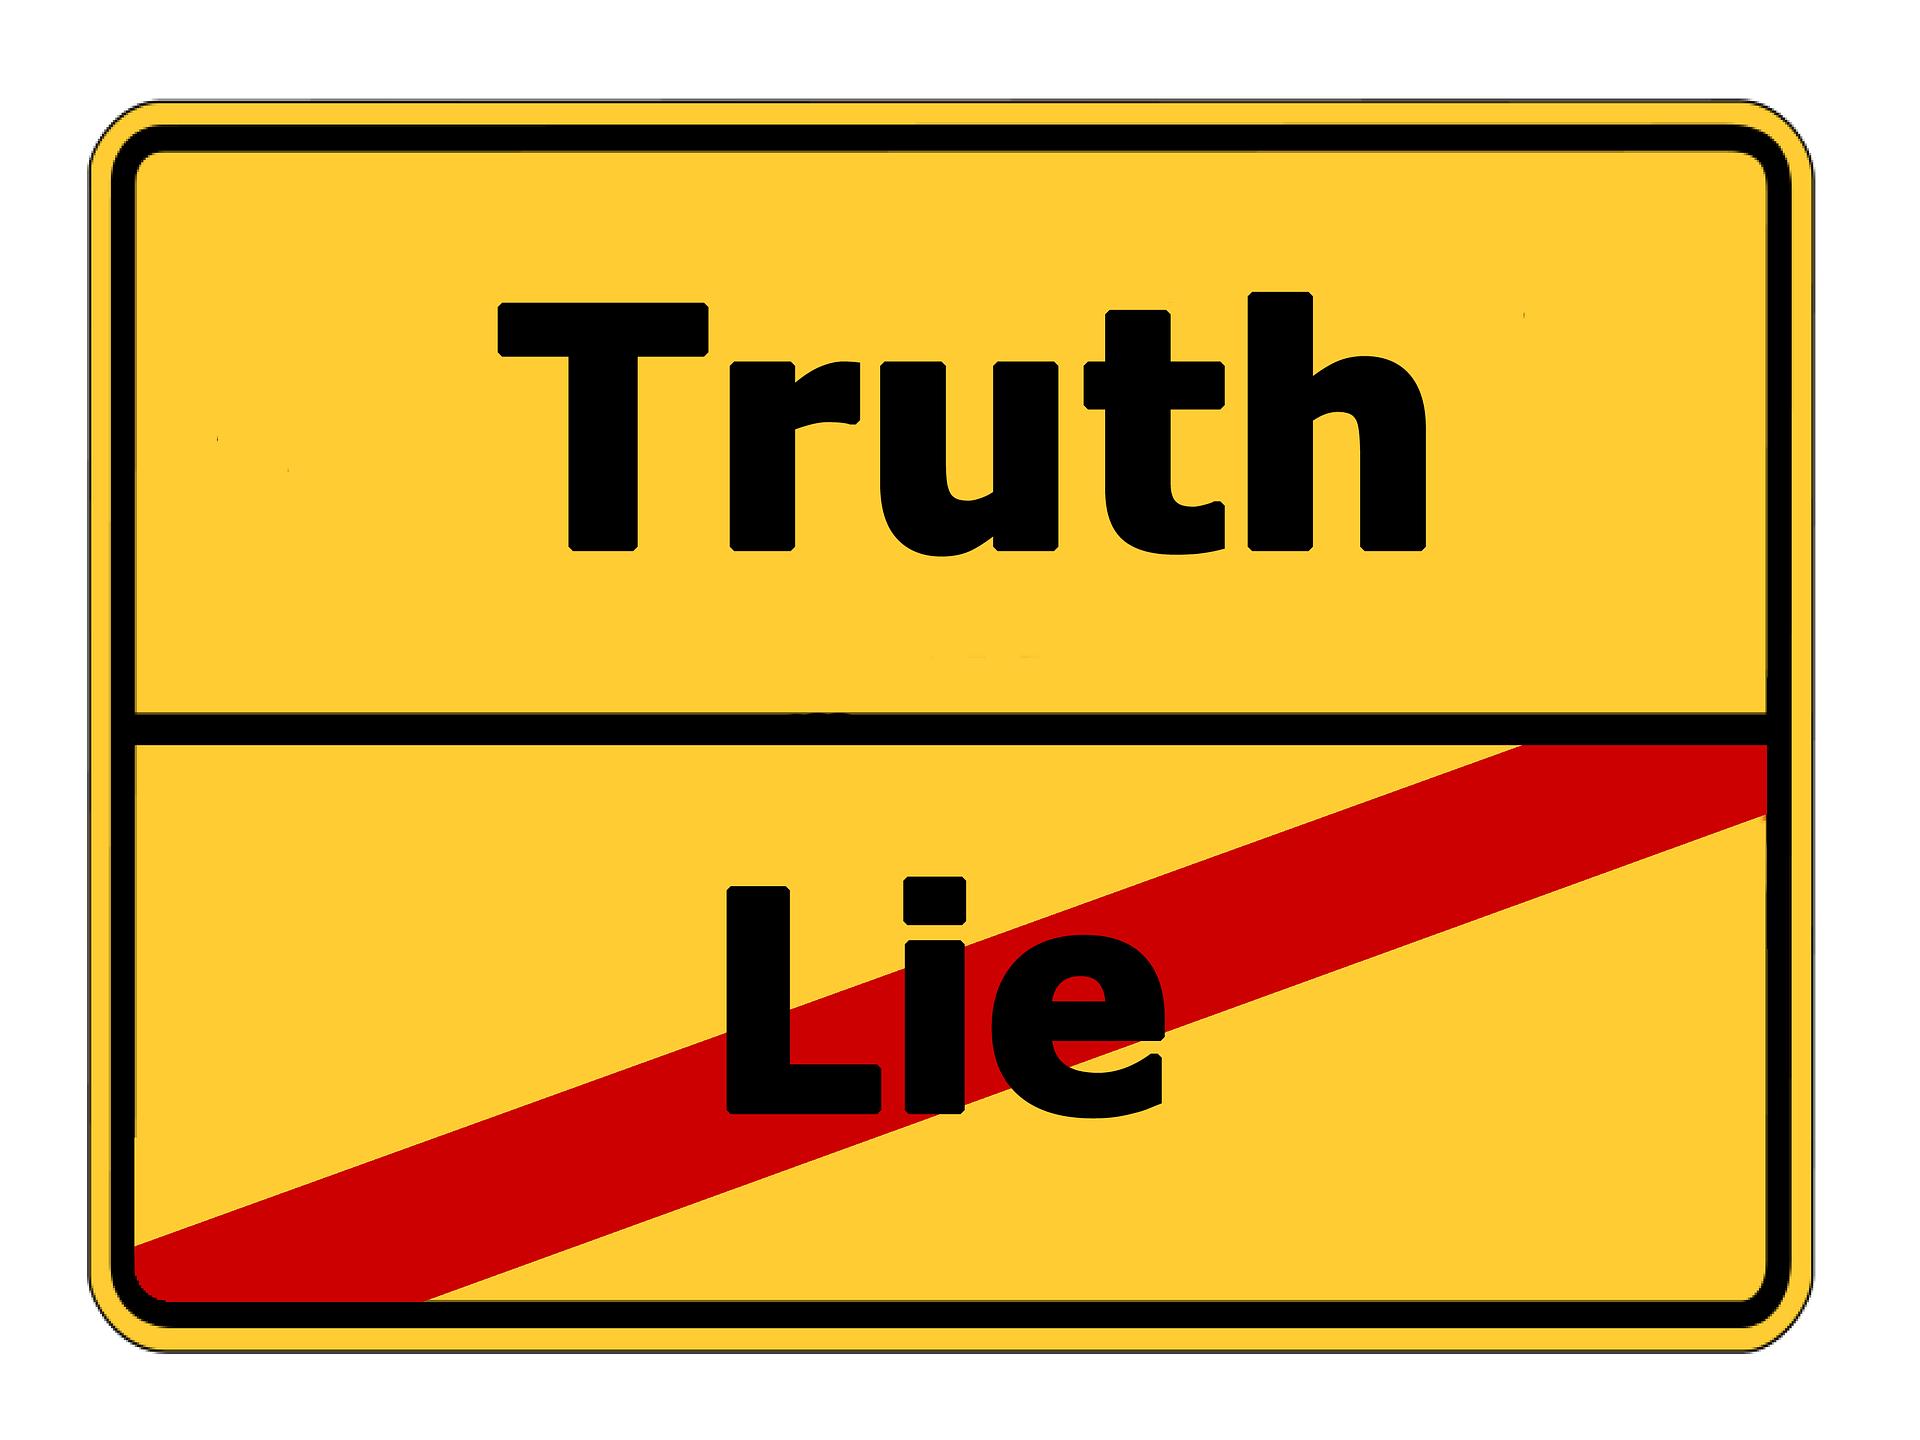 truth-257159_1920